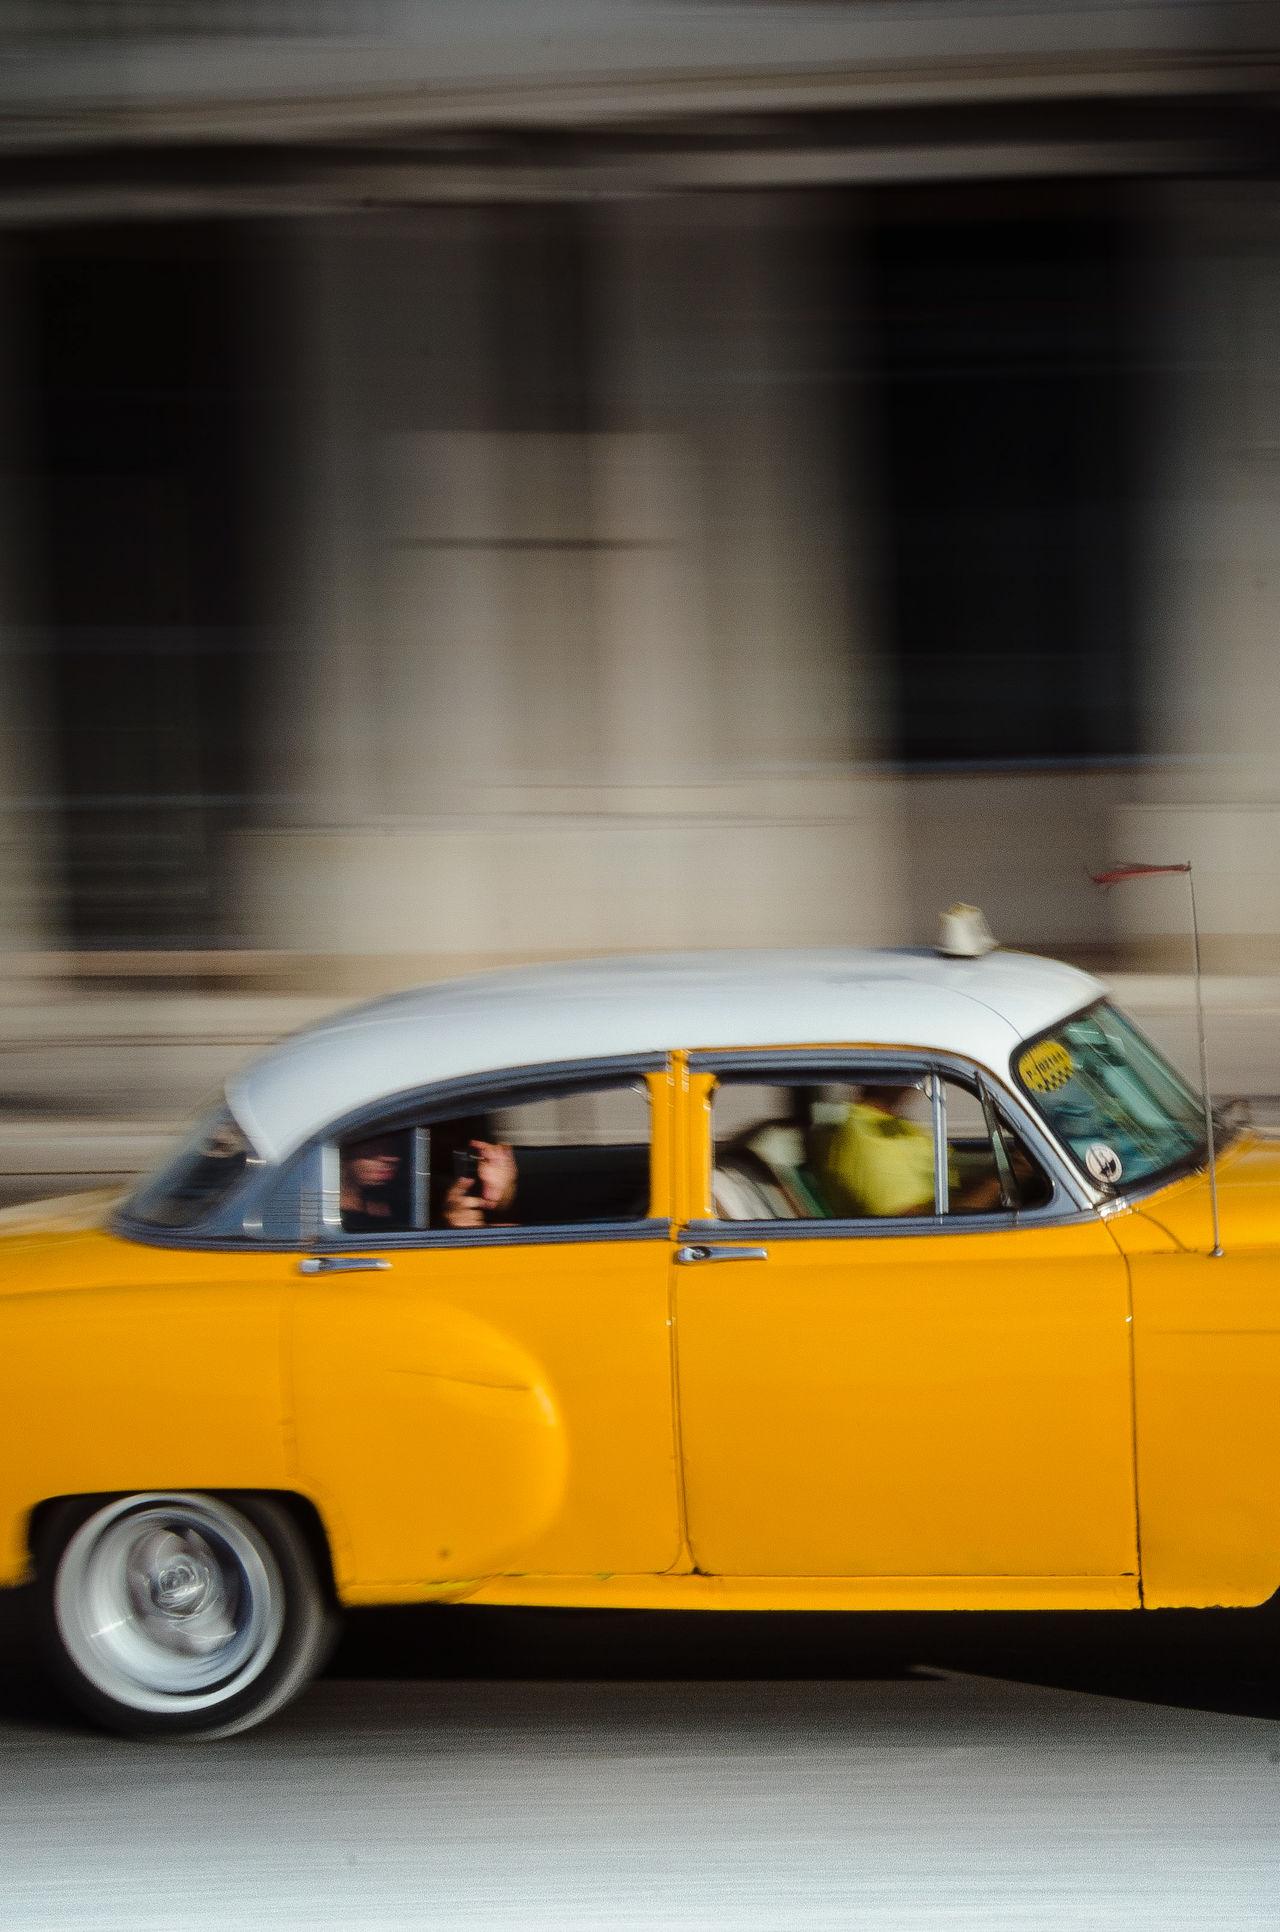 Taxi yellow taxi car yellow Transportation mode of transport outdoors City people day one person streetphotography EyeEm street photography EyeEm Best Shots cuba havana street Cuba havana Malecon